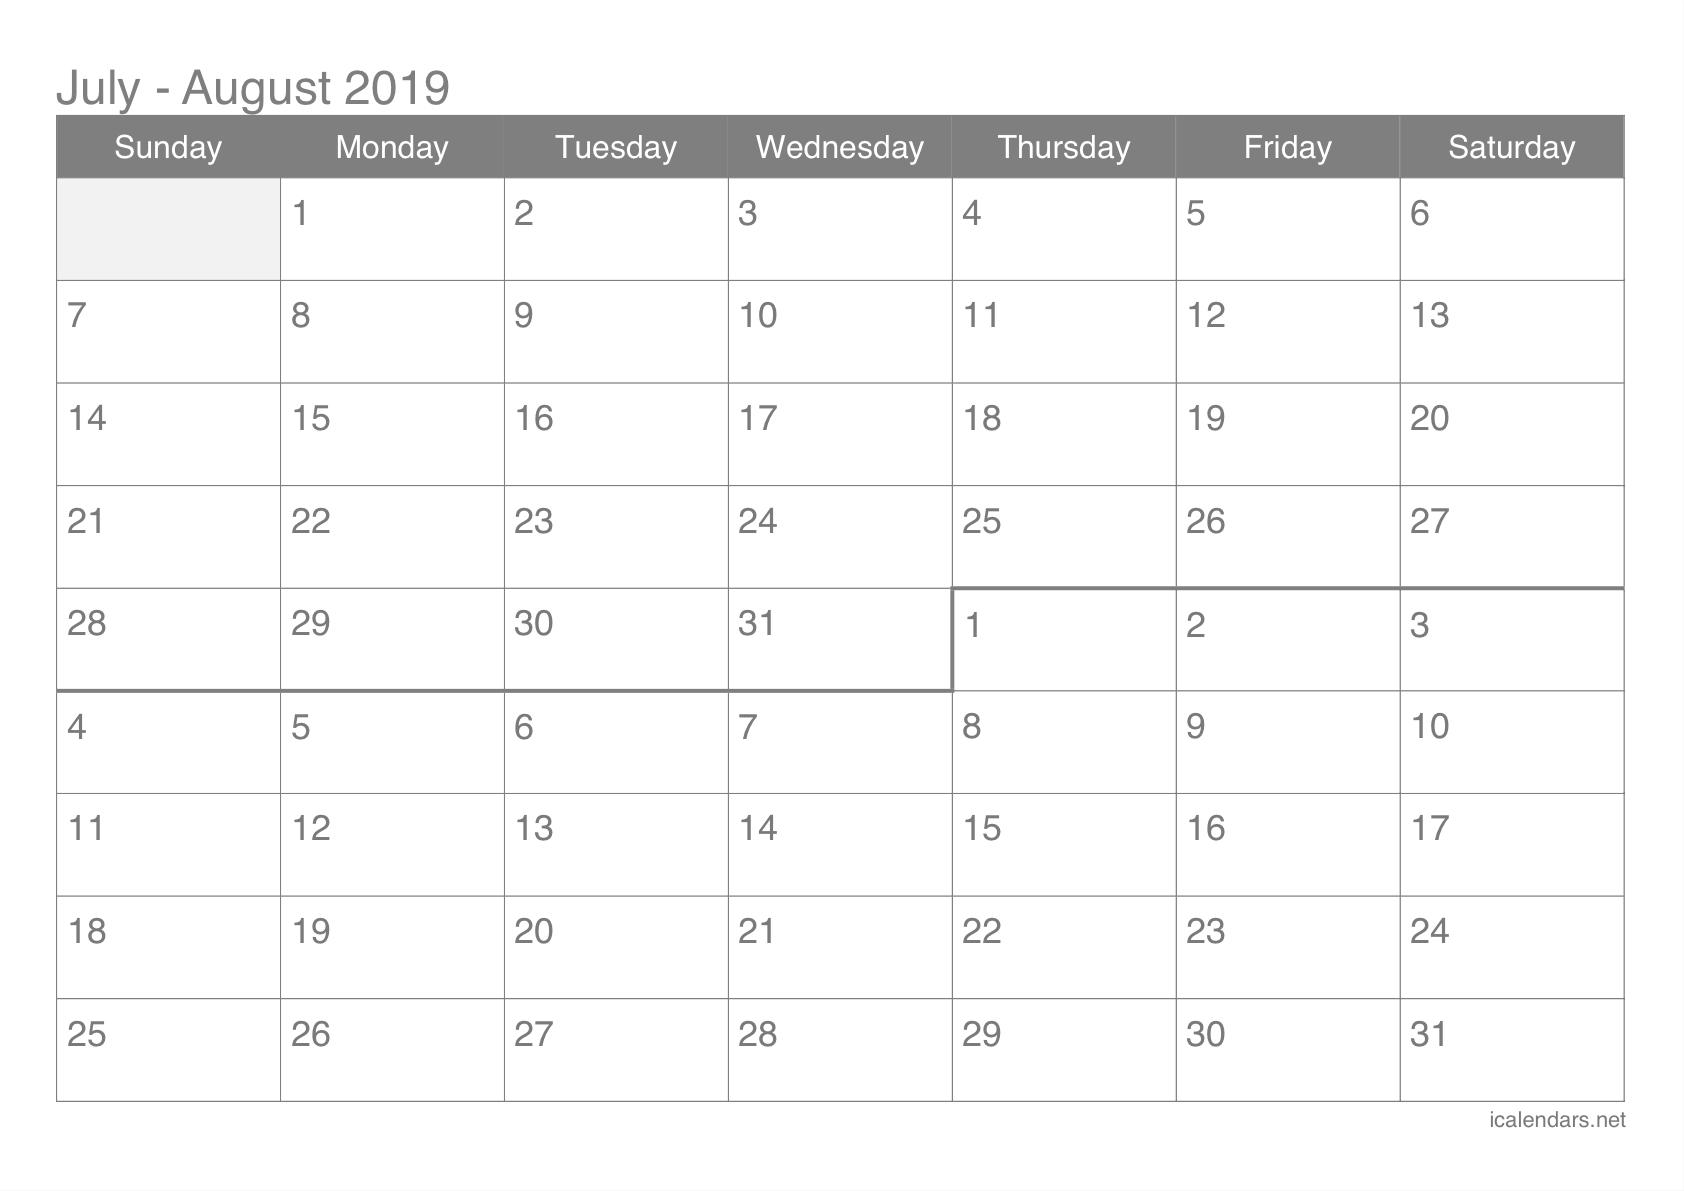 July And August 2019 Printable Calendar - Icalendars inside Blank Calendar June July